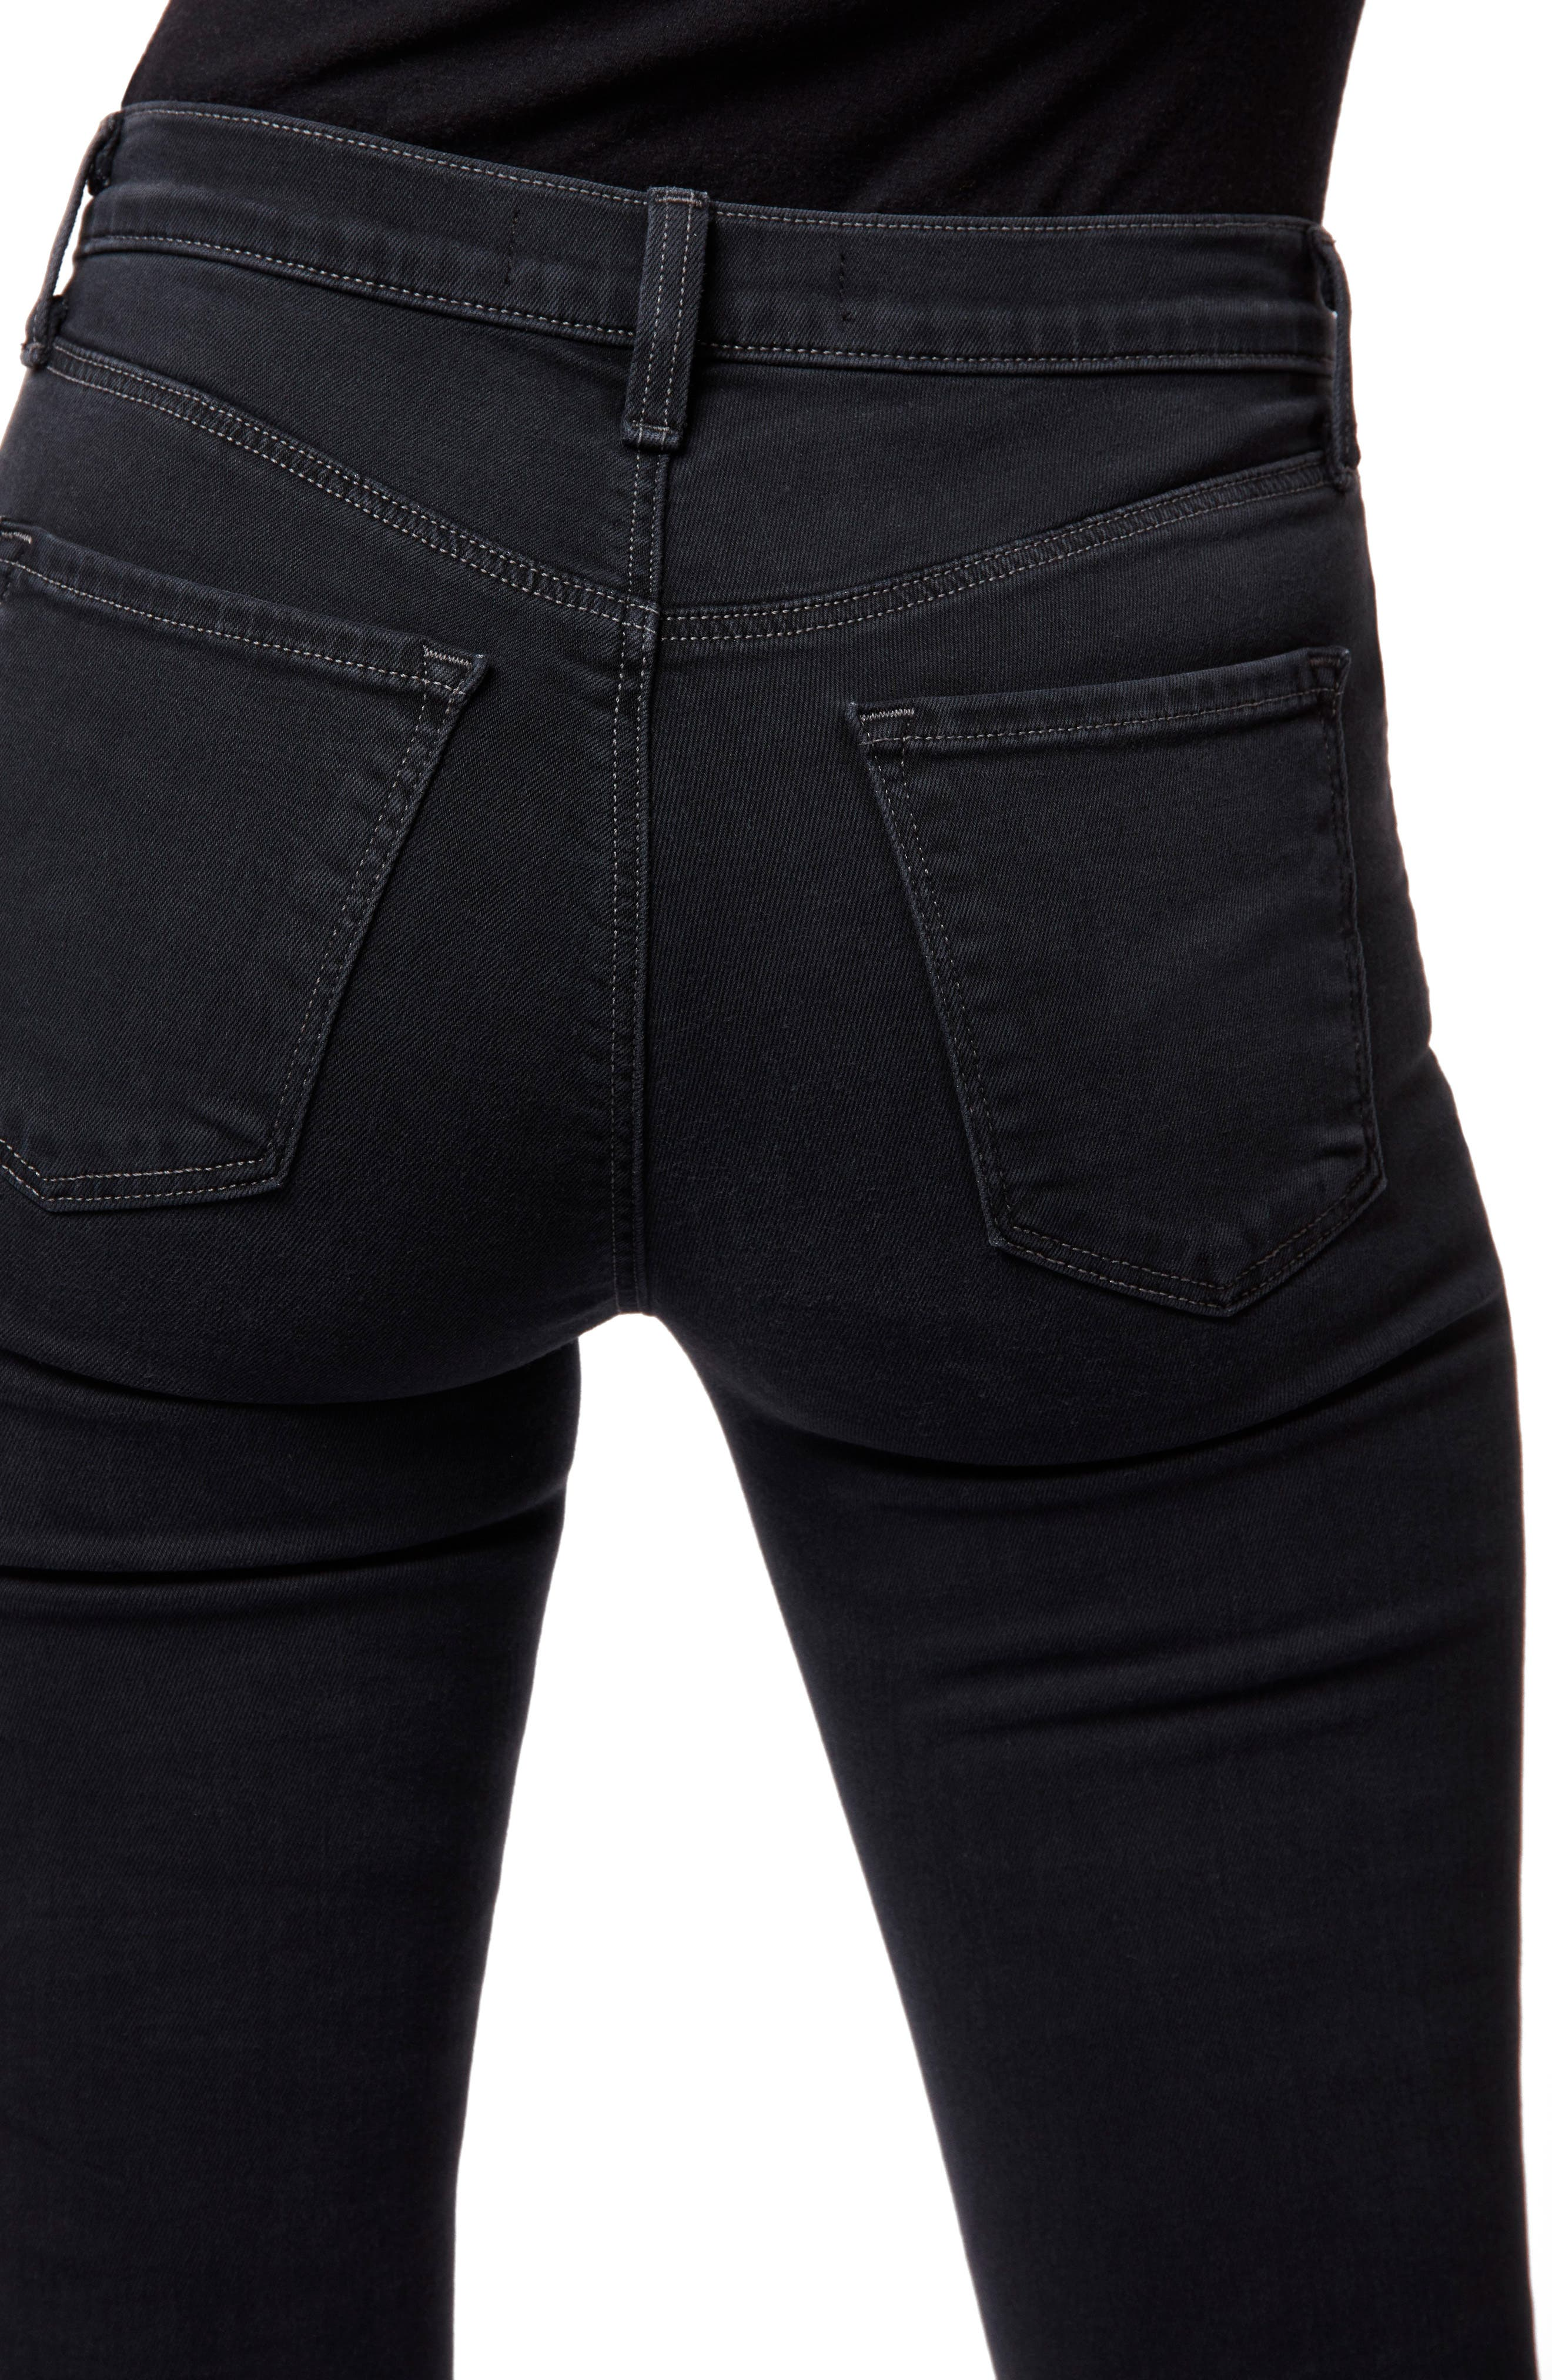 Maria High Waist Skinny Jeans,                             Alternate thumbnail 4, color,                             002